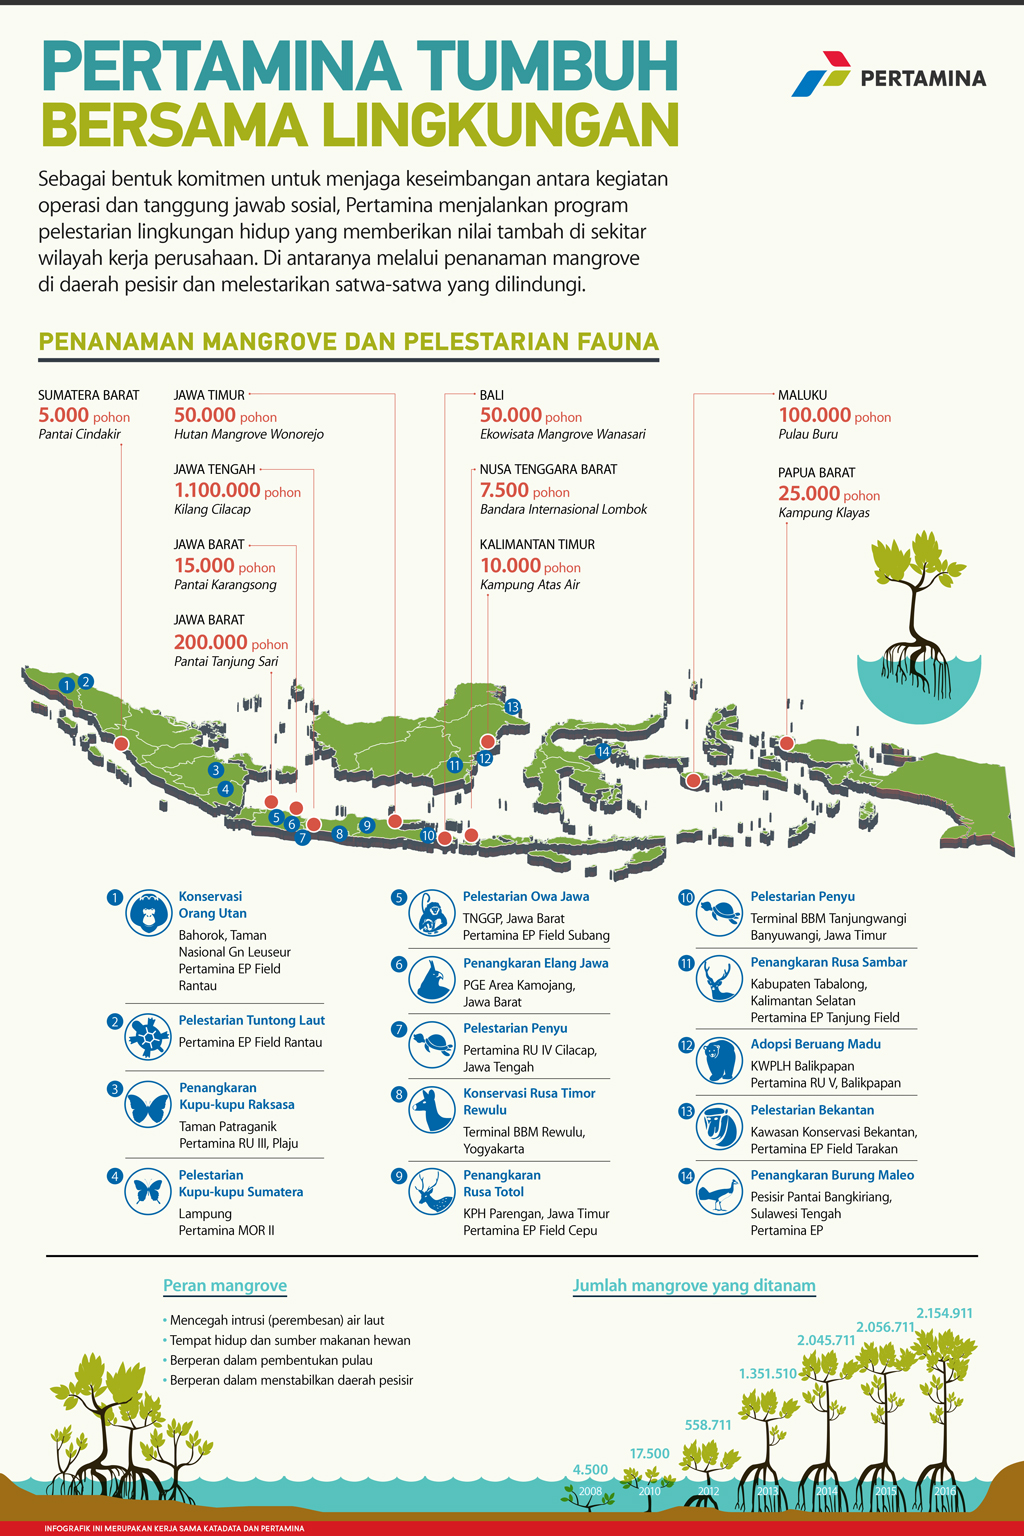 Pertamina Tumbuh Bersama Lingkungan